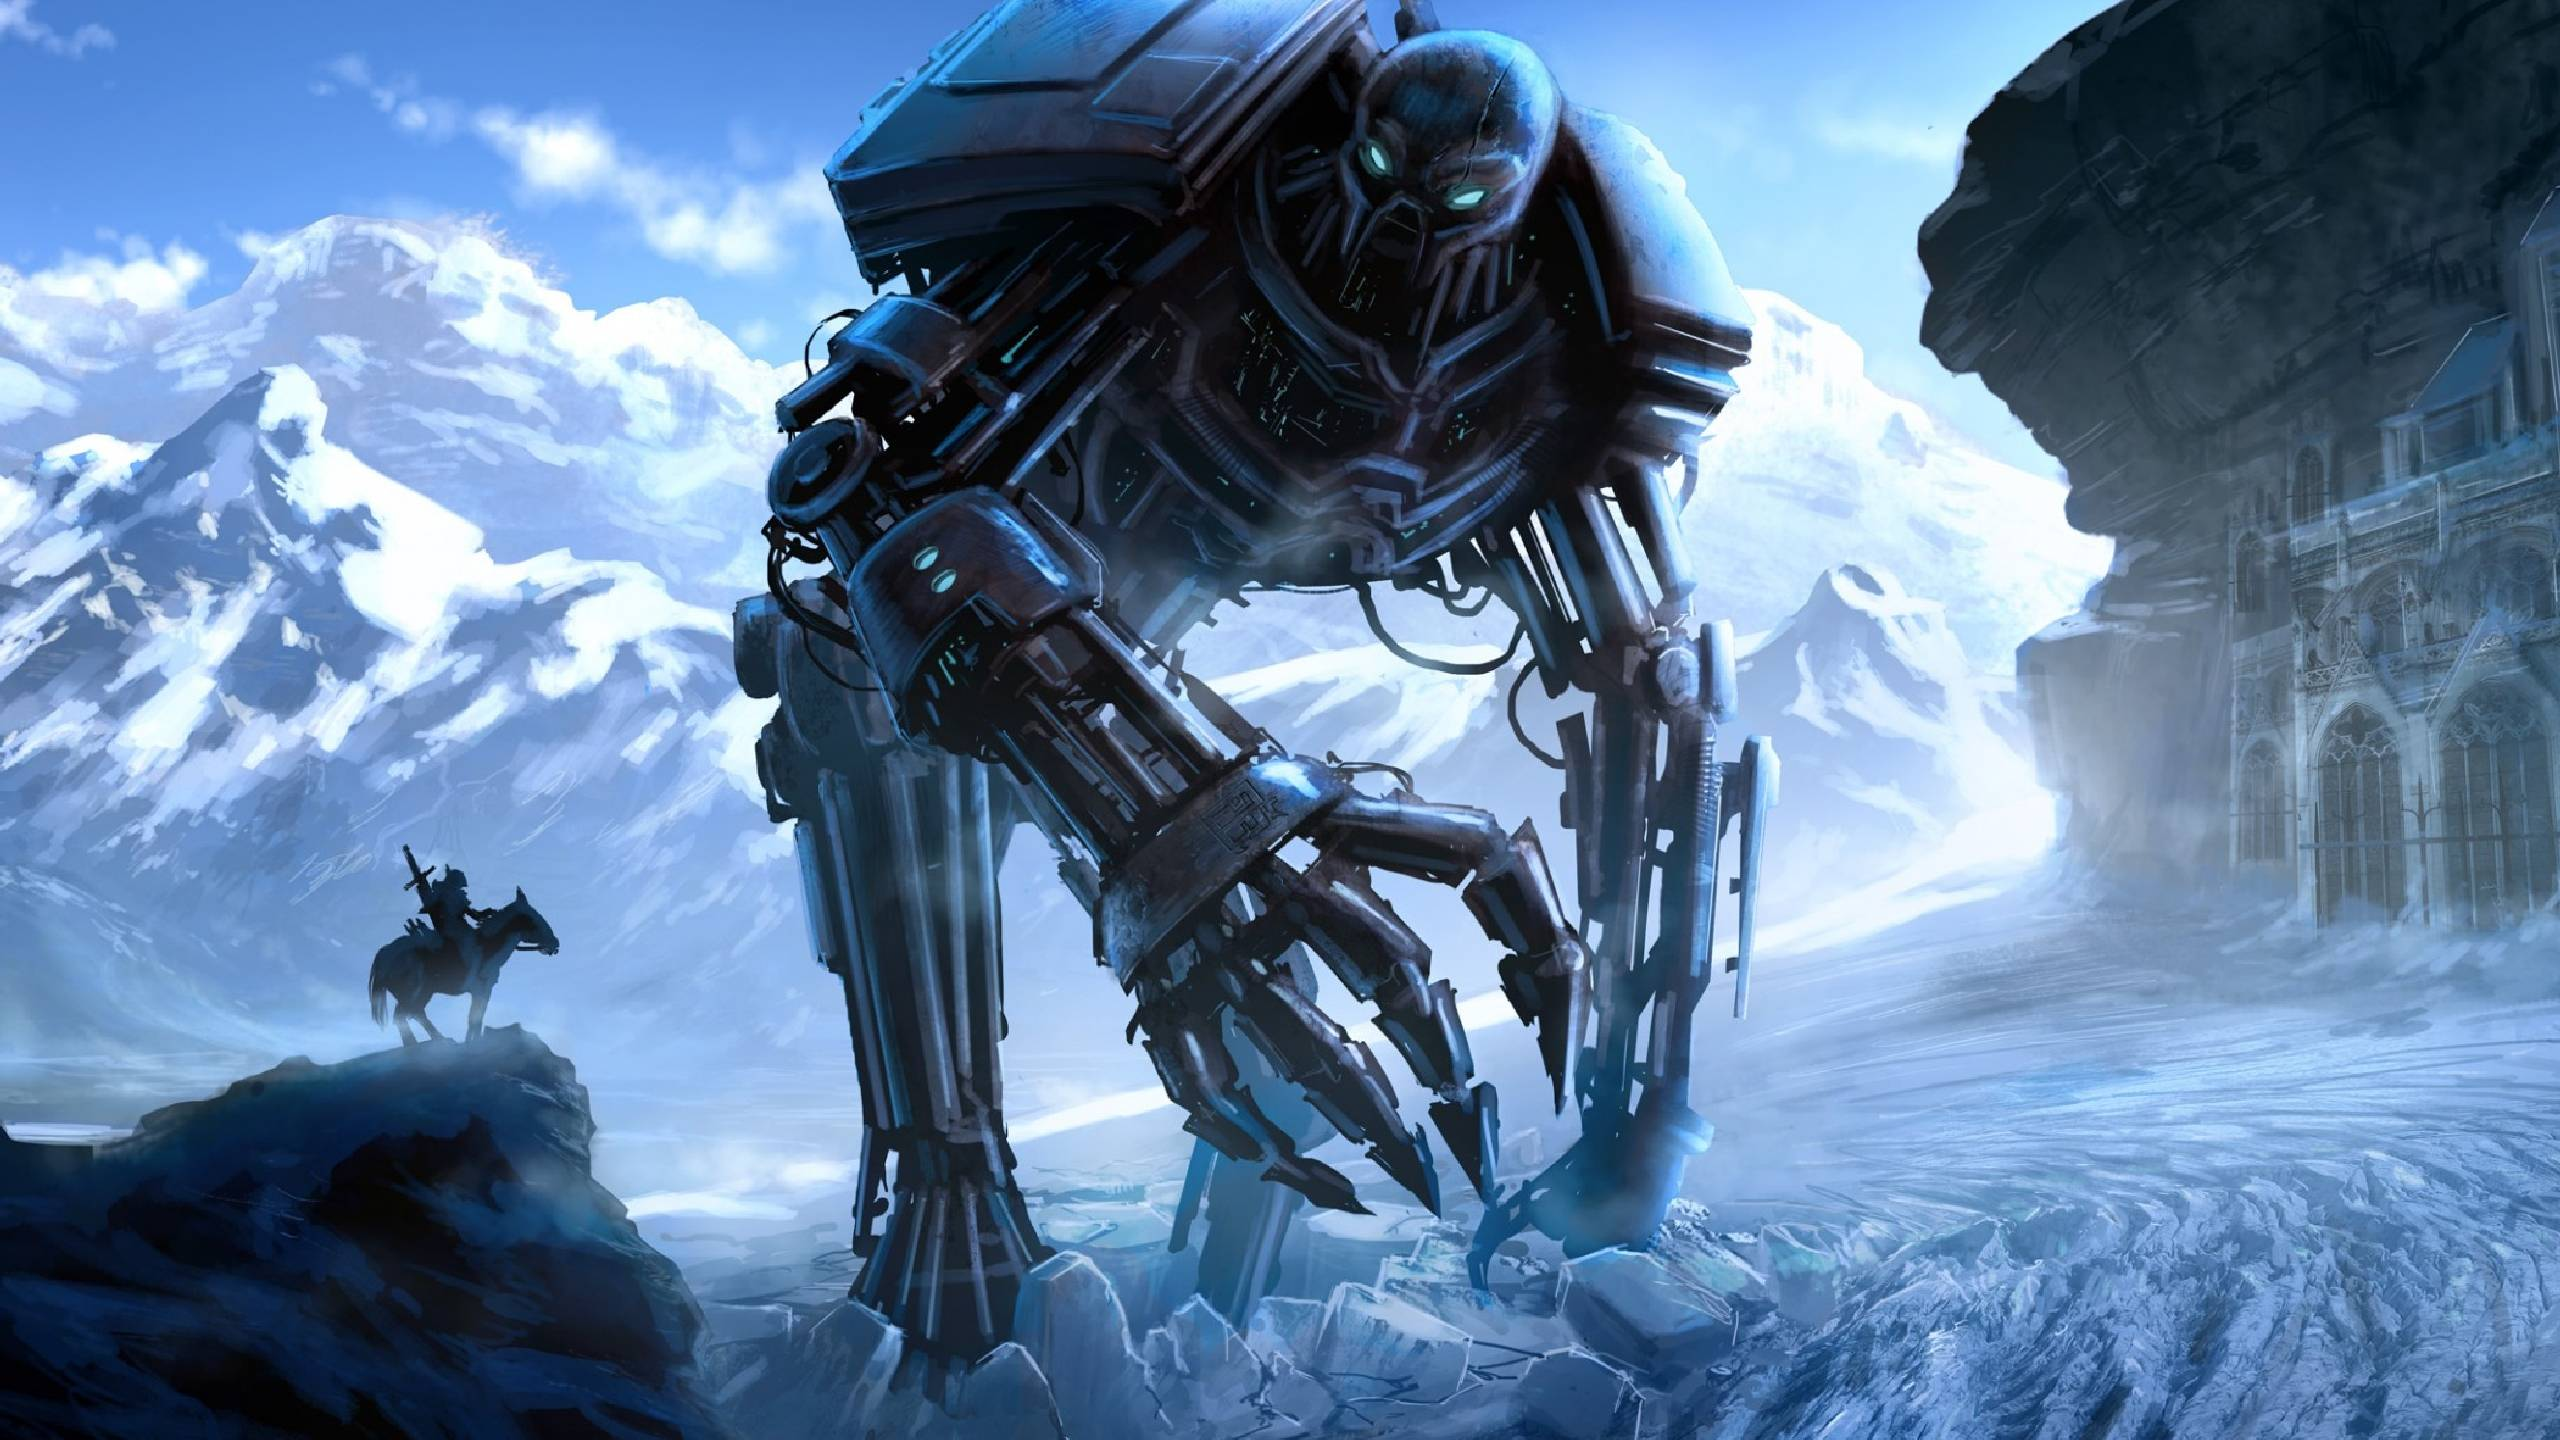 sci_fi_fiction_robot_wallpaper_hd